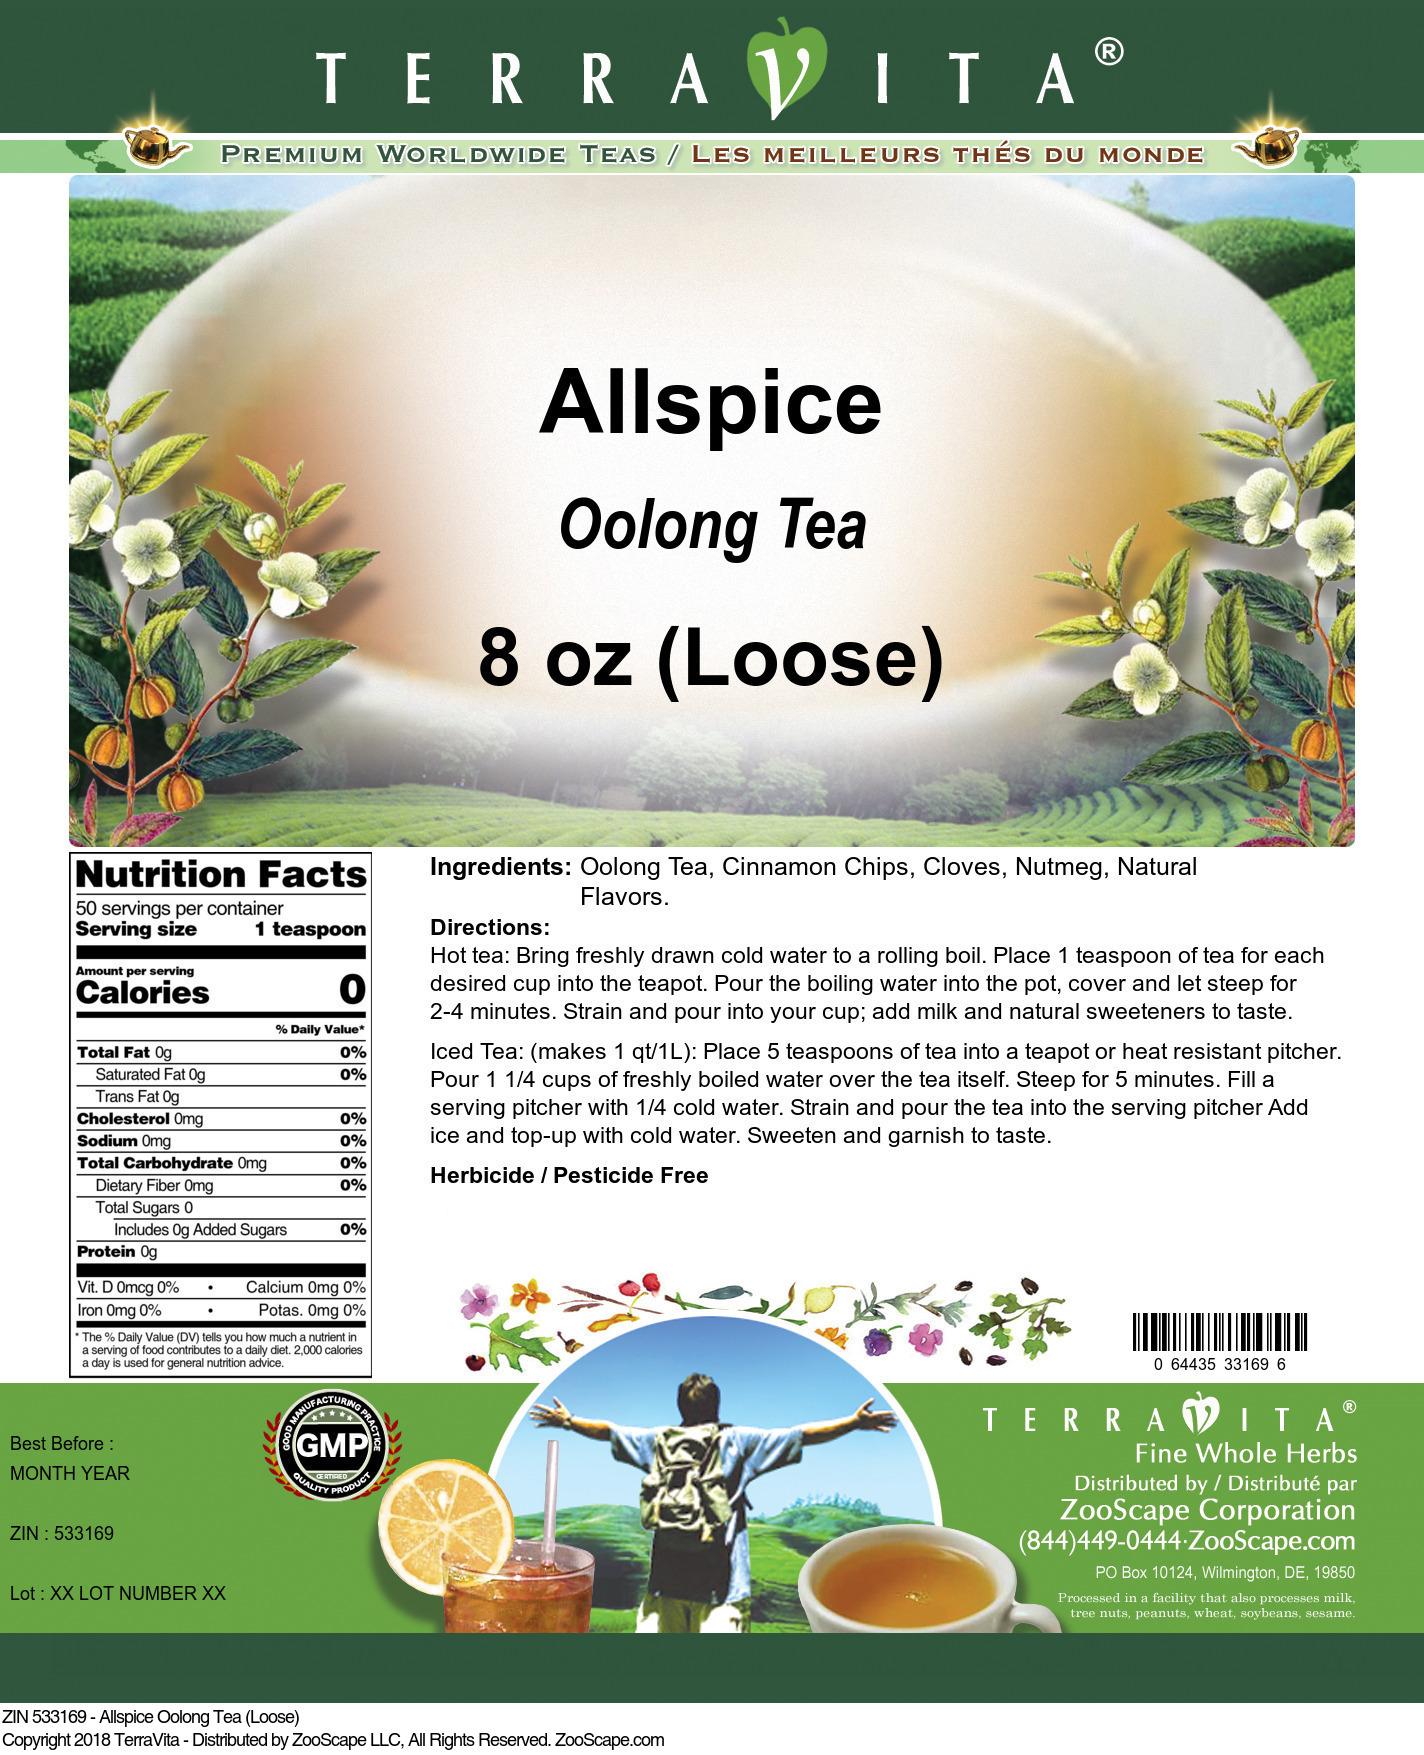 Allspice Oolong Tea (Loose)